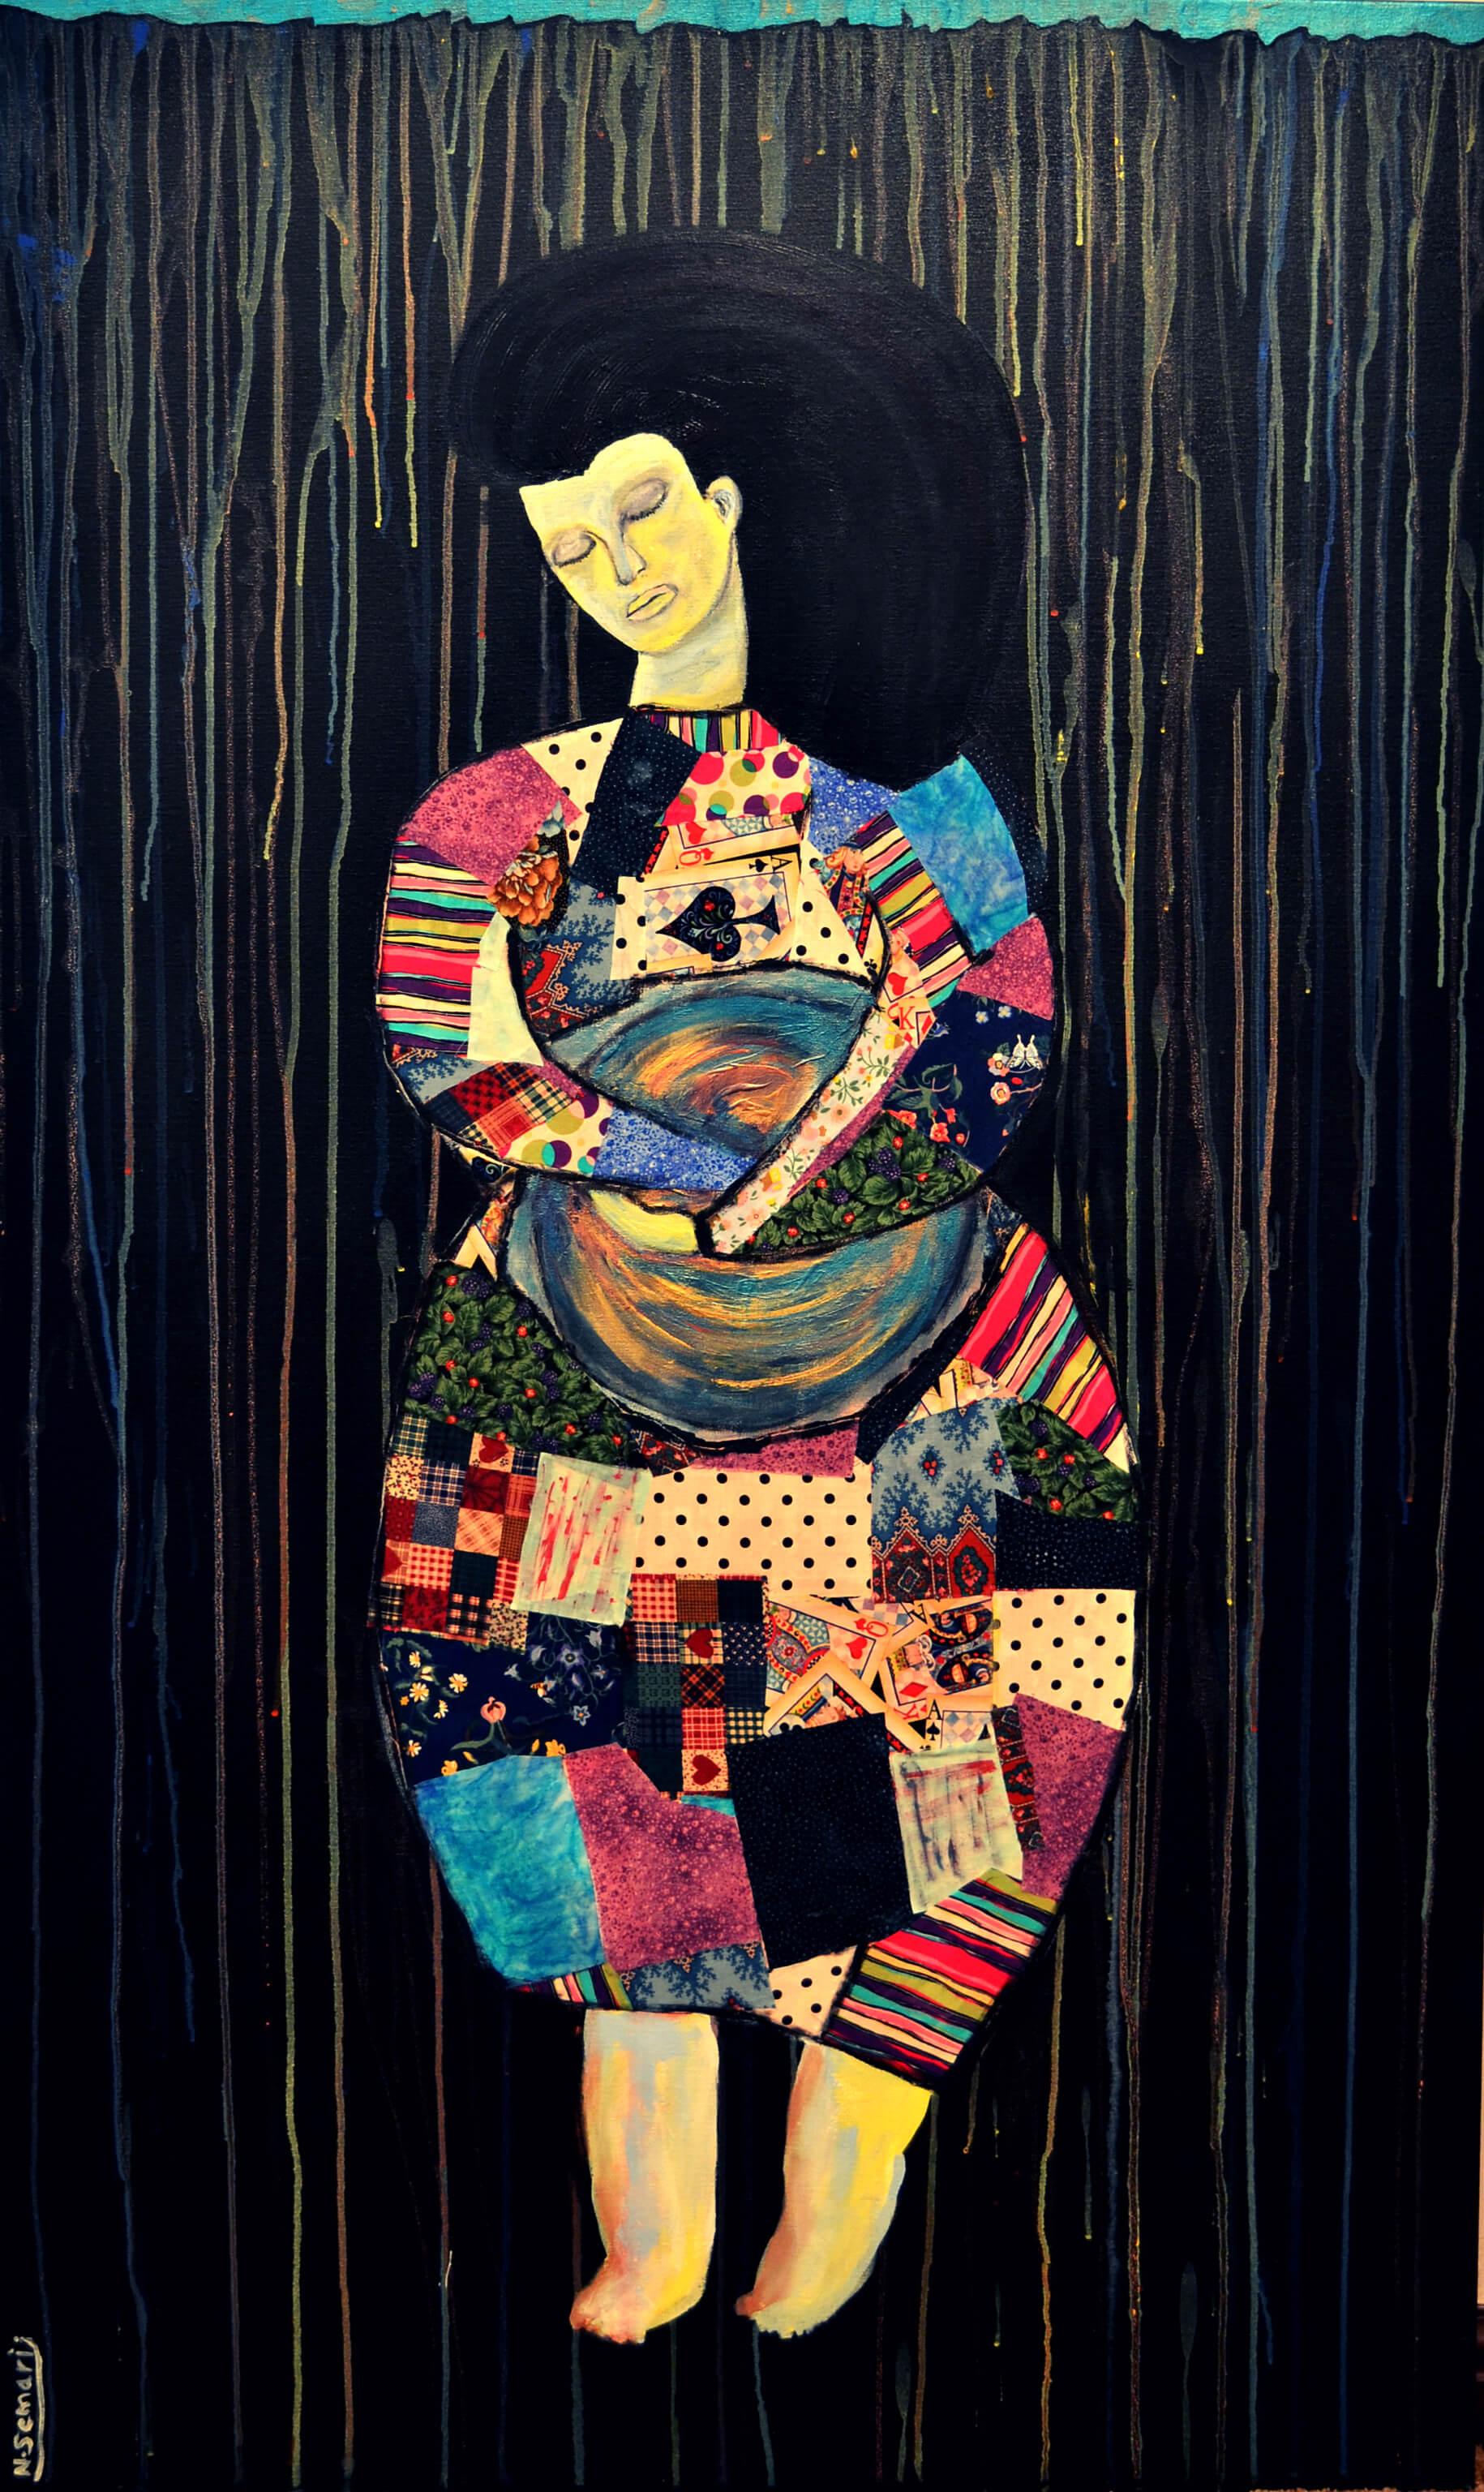 Dreamer - mixed media - 152x92 cm By Nouf Semari